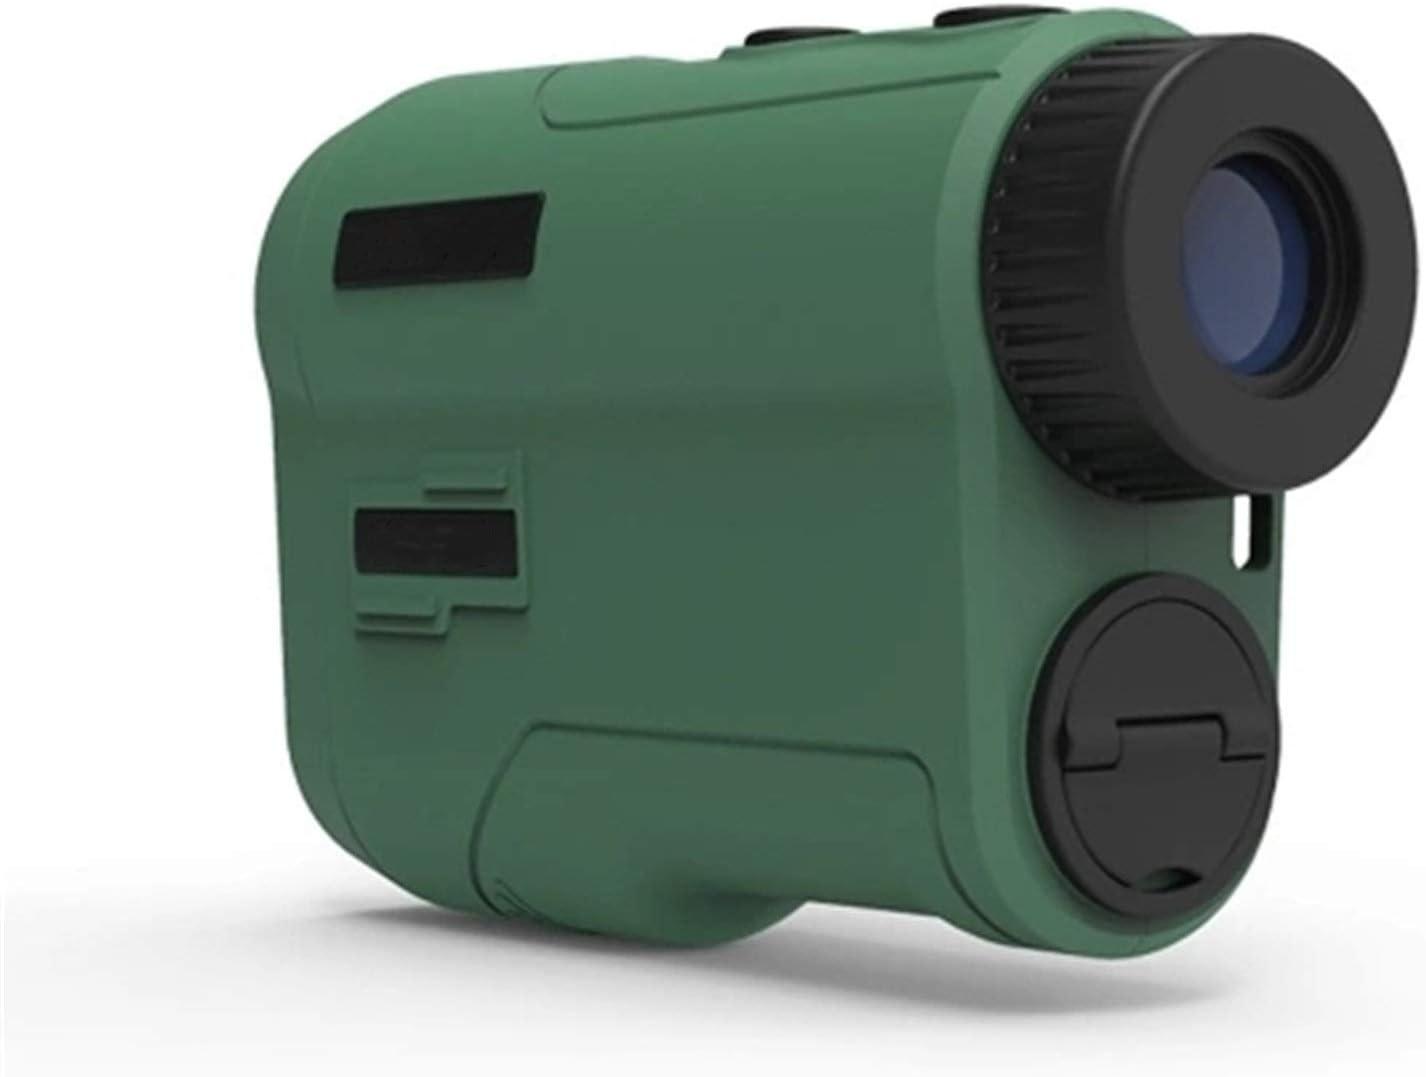 yaunli Telémetro de Golf RangeFinder 600m 6X Ampliación HD Vista de HD Gama de golfFinder USB Recargable Telescopio Telémetro de Golf Impermeable (Color : Verde, Size : One Size)